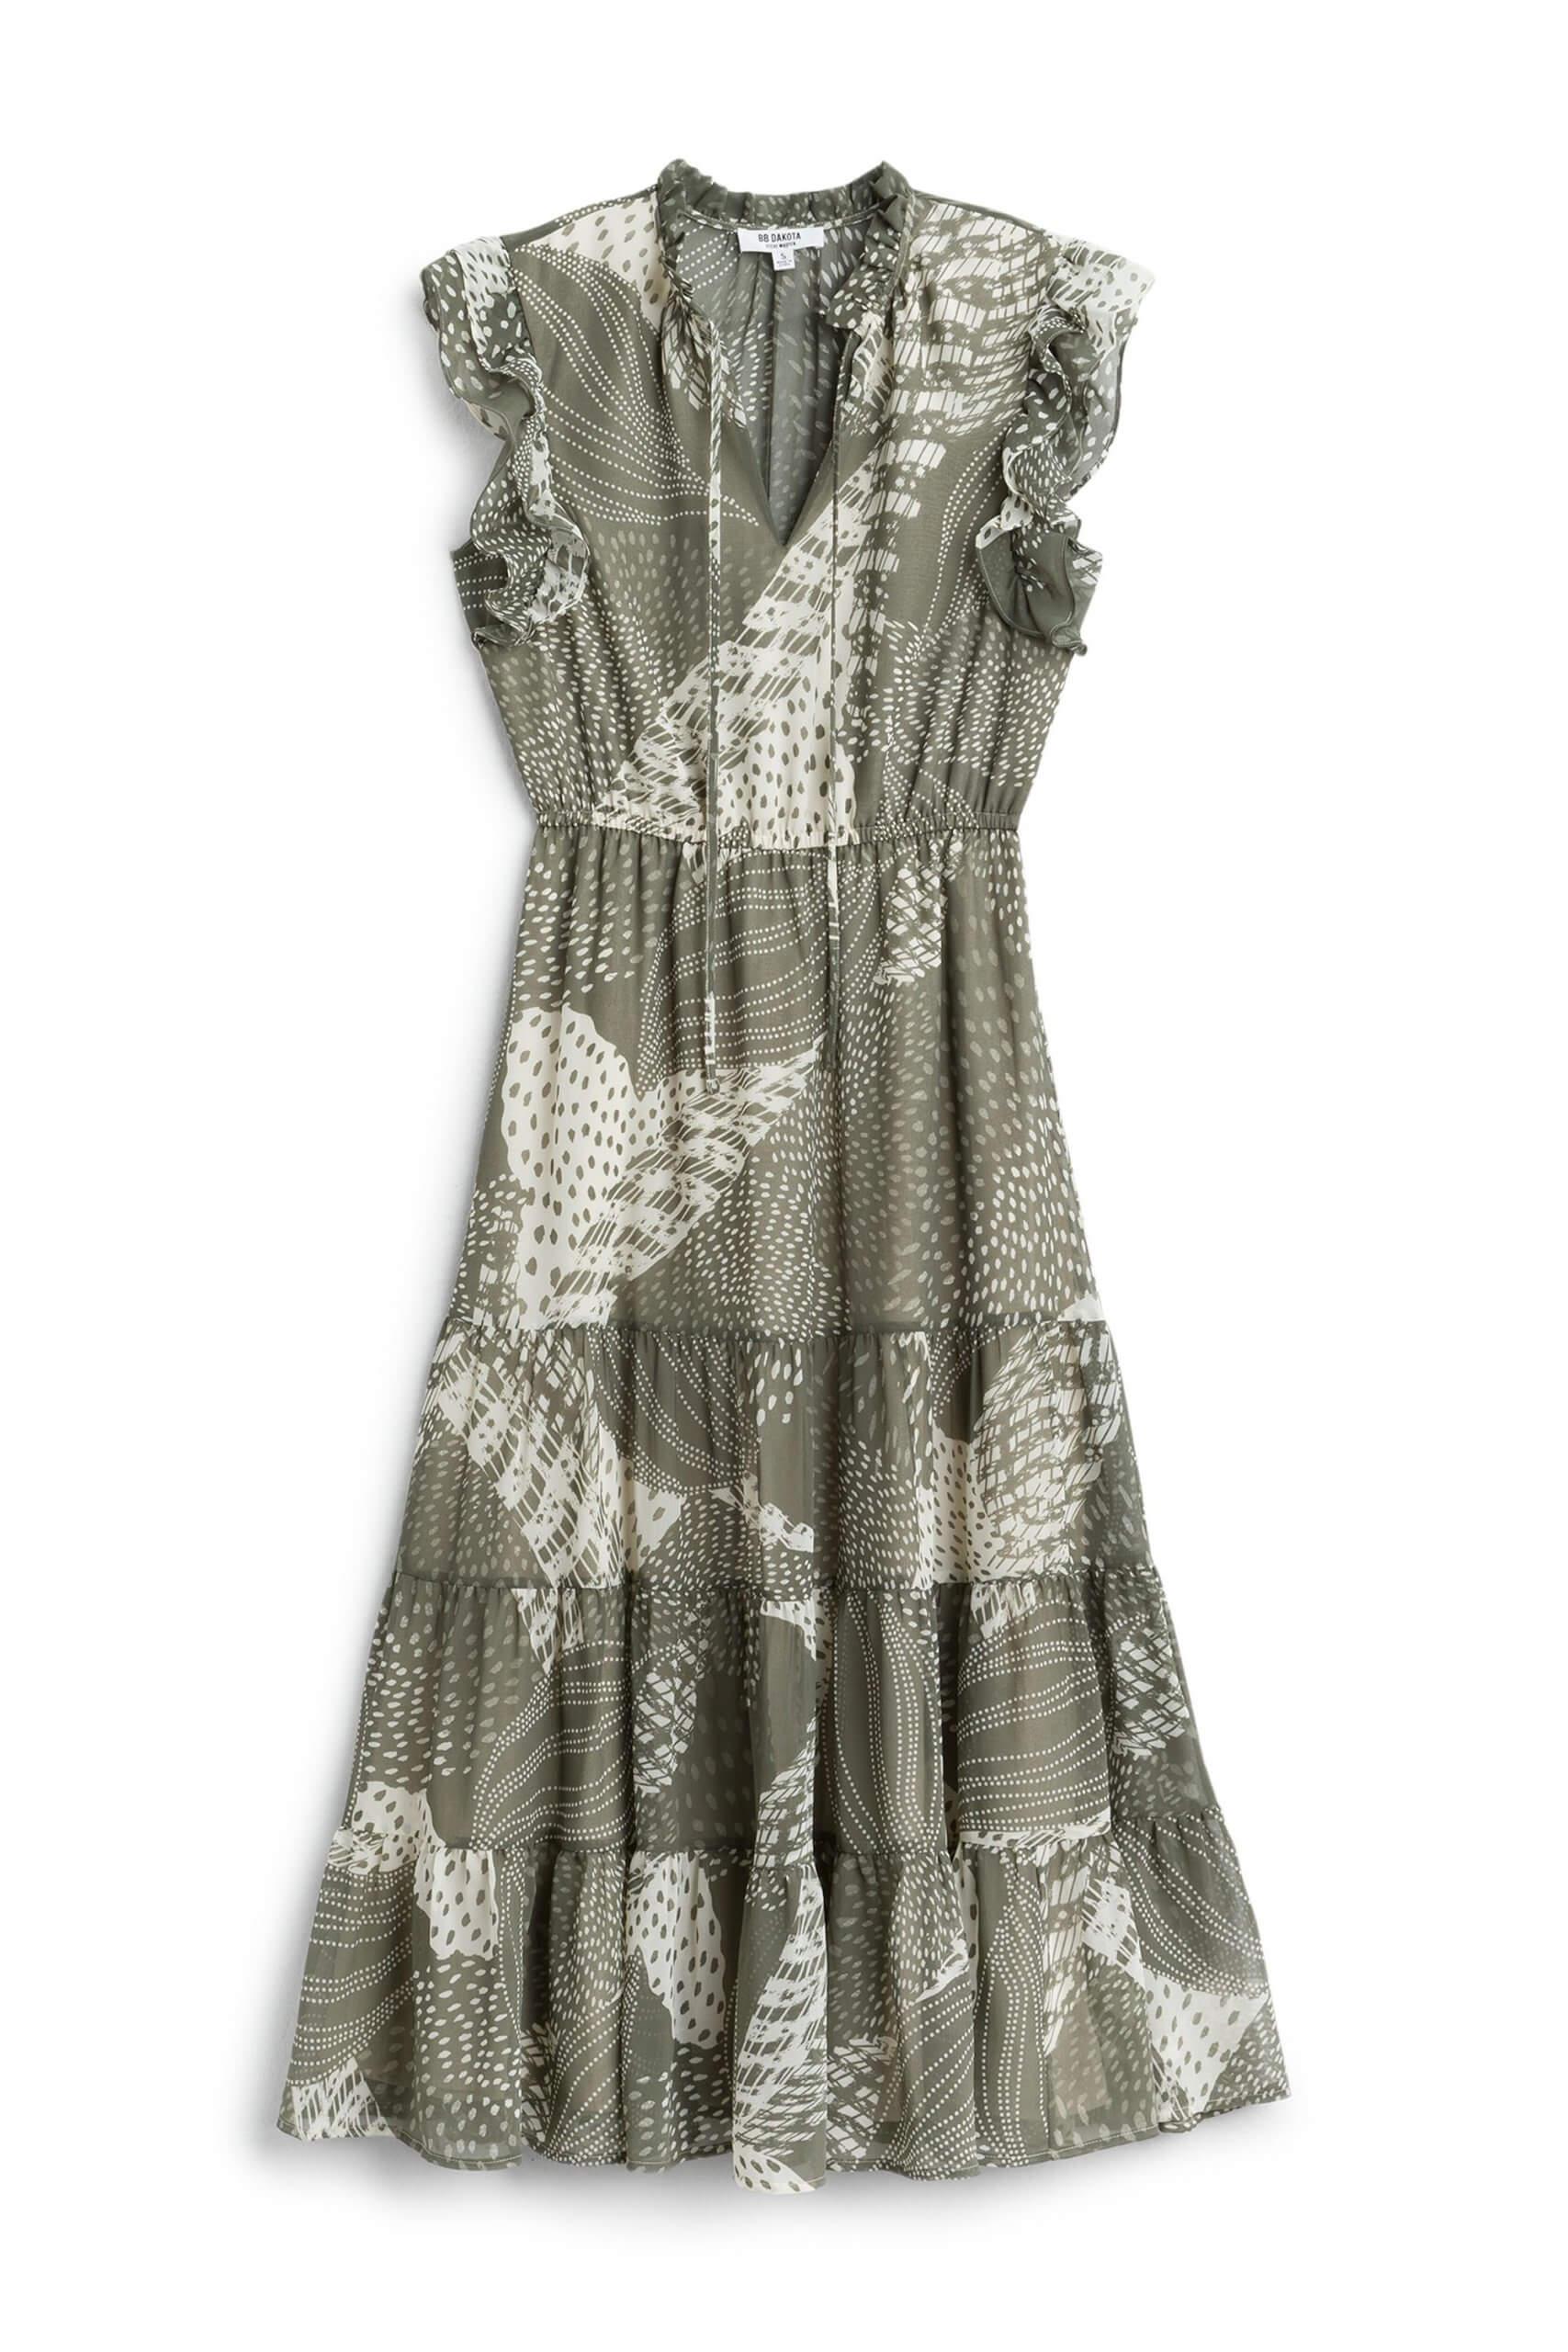 Stitch Fix women's olive patterned midi dress.